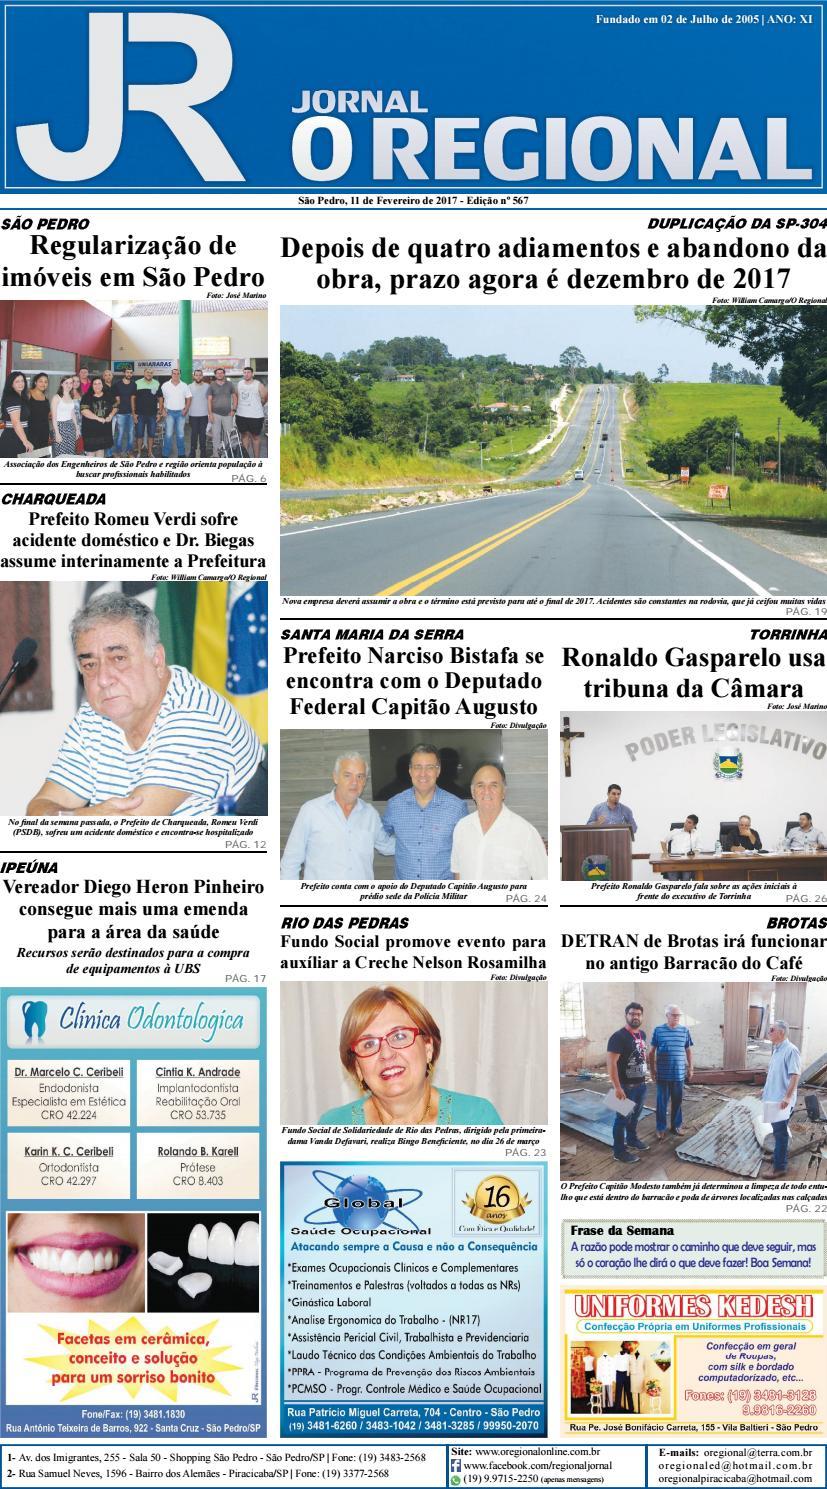 7806aac57d Jornal o regional edição 567 11 02 2017 site by Jornal O Regional - issuu